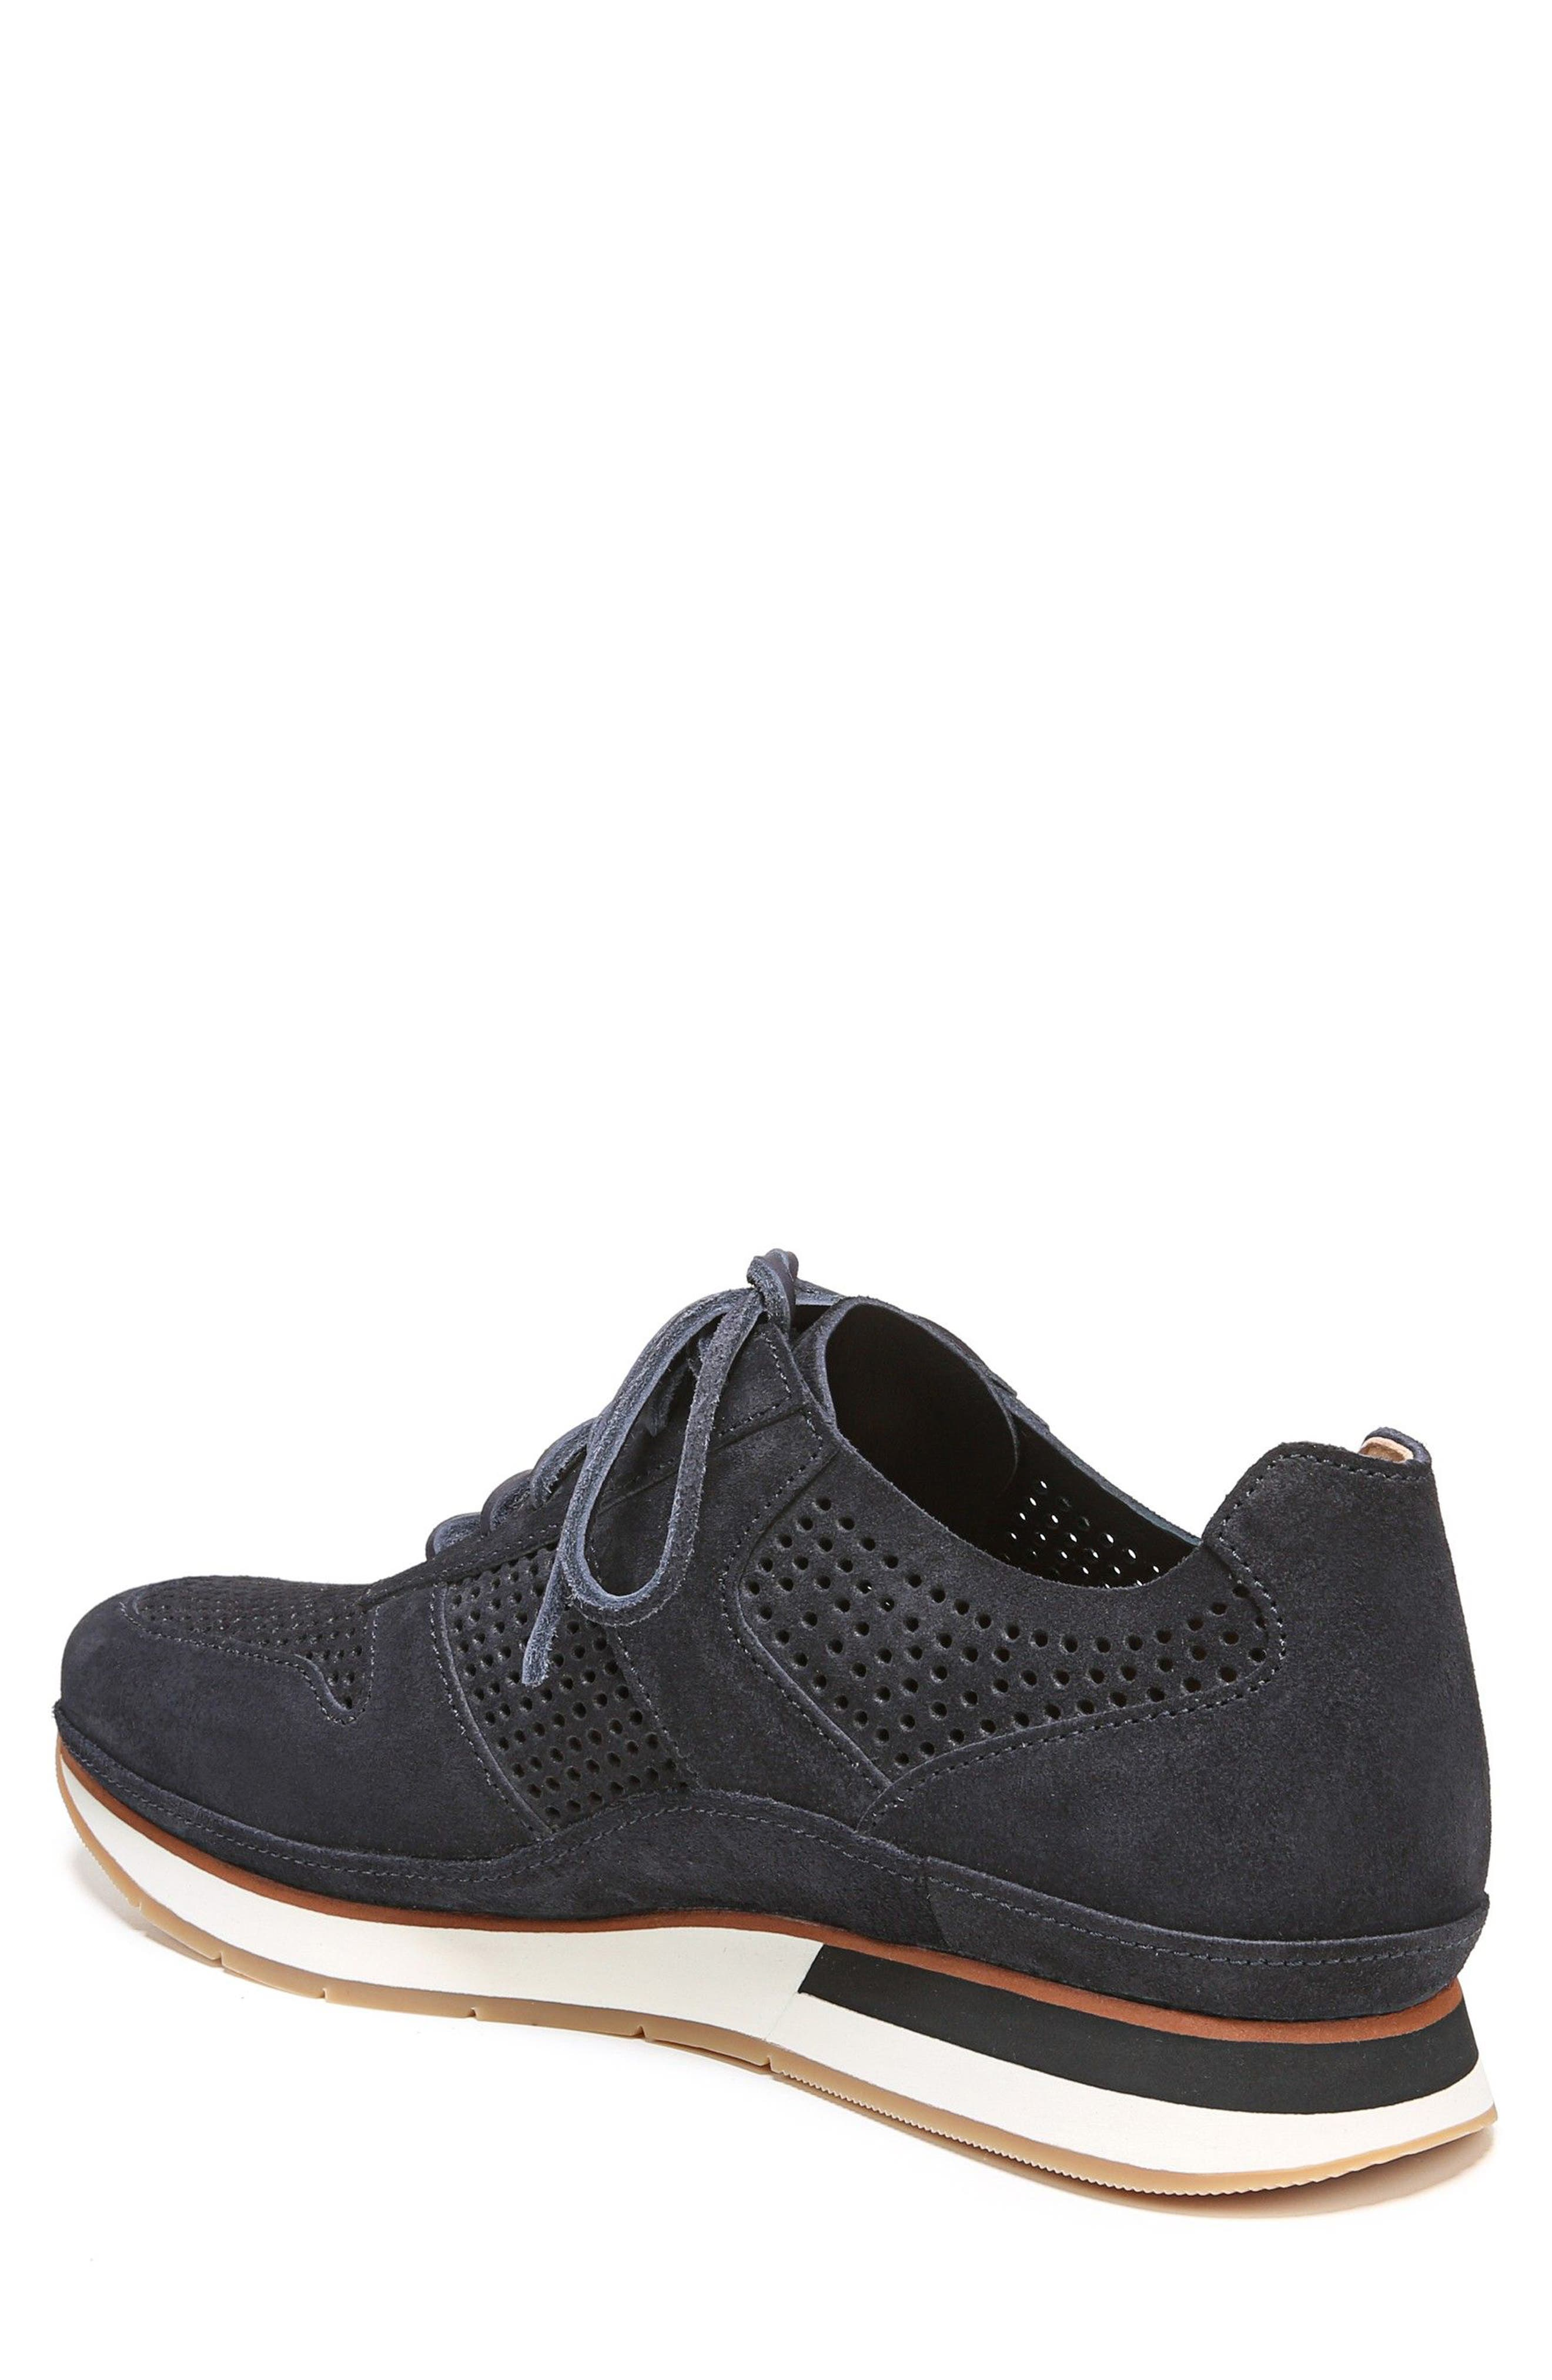 Larson Perforated Sneaker,                             Alternate thumbnail 2, color,                             Coastal